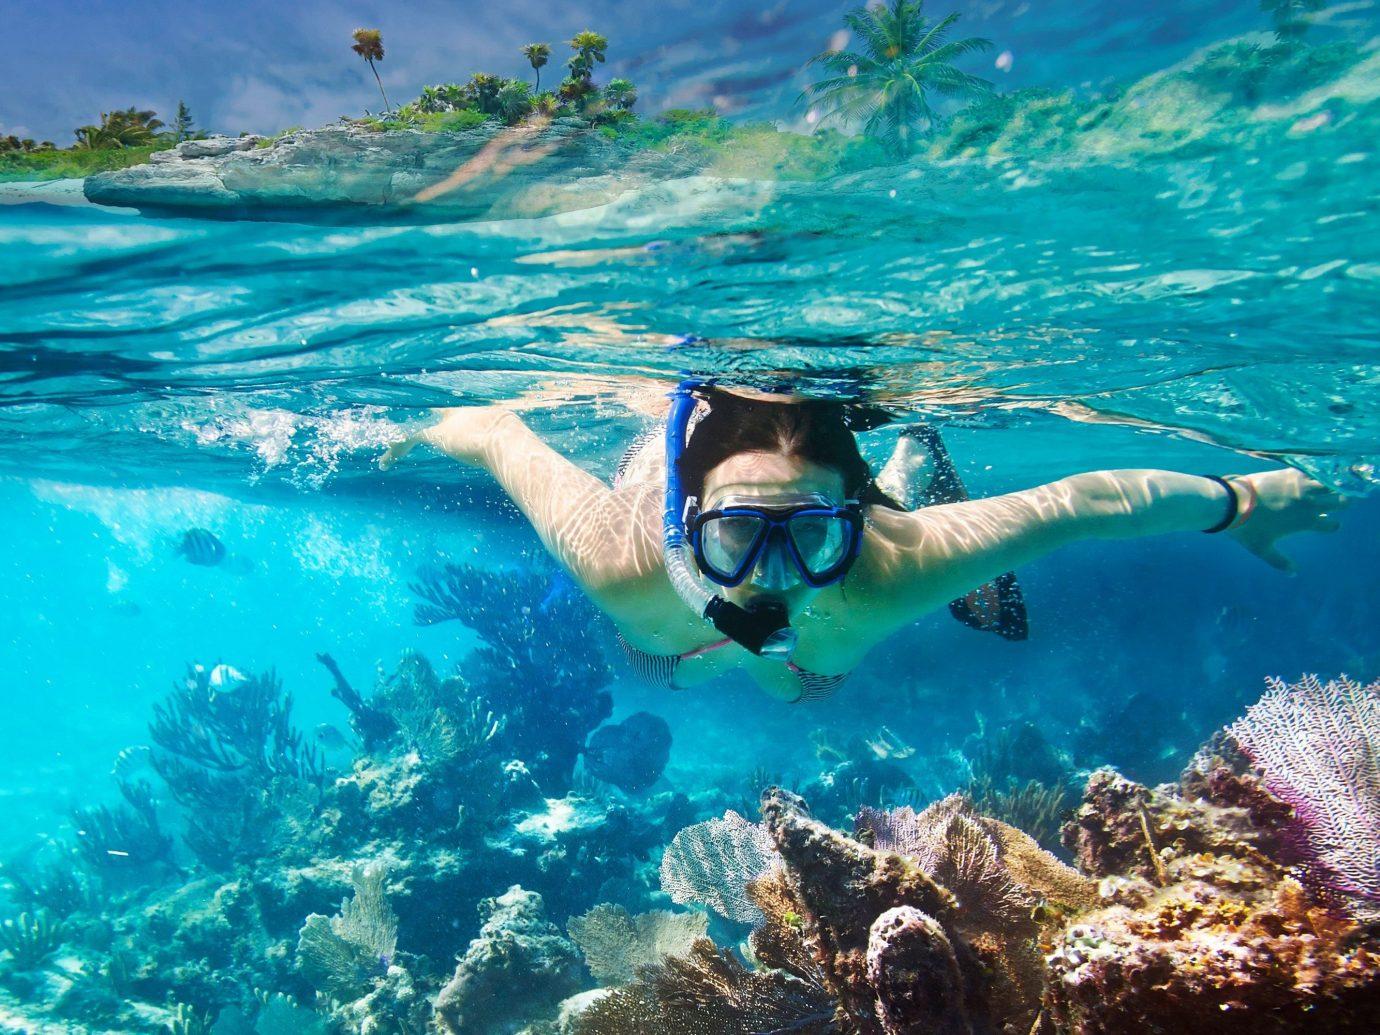 Trip Ideas water Sport swimming outdoor water sport marine biology sports Sea underwater reef coral reef Ocean biology snorkeling outdoor recreation diving recreation Scuba Diving